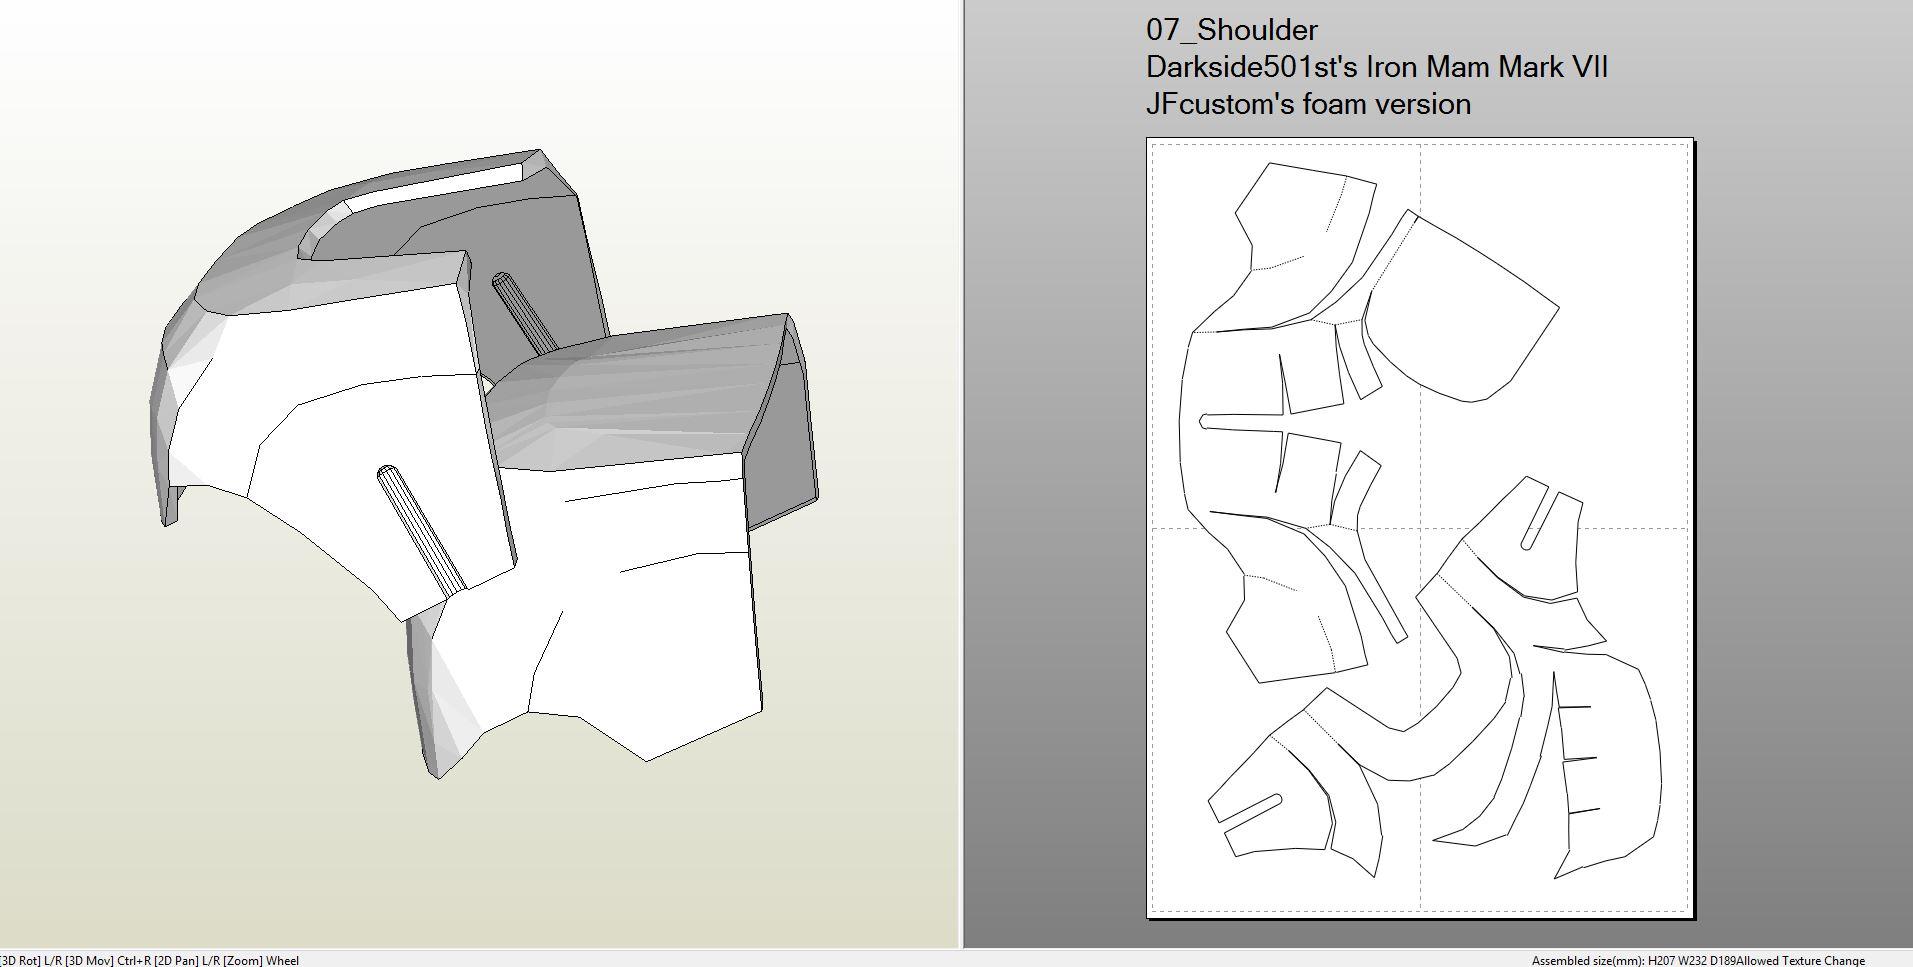 Foamcraft Pdo File Template For Iron Man Mark 7 Full Armor Foam